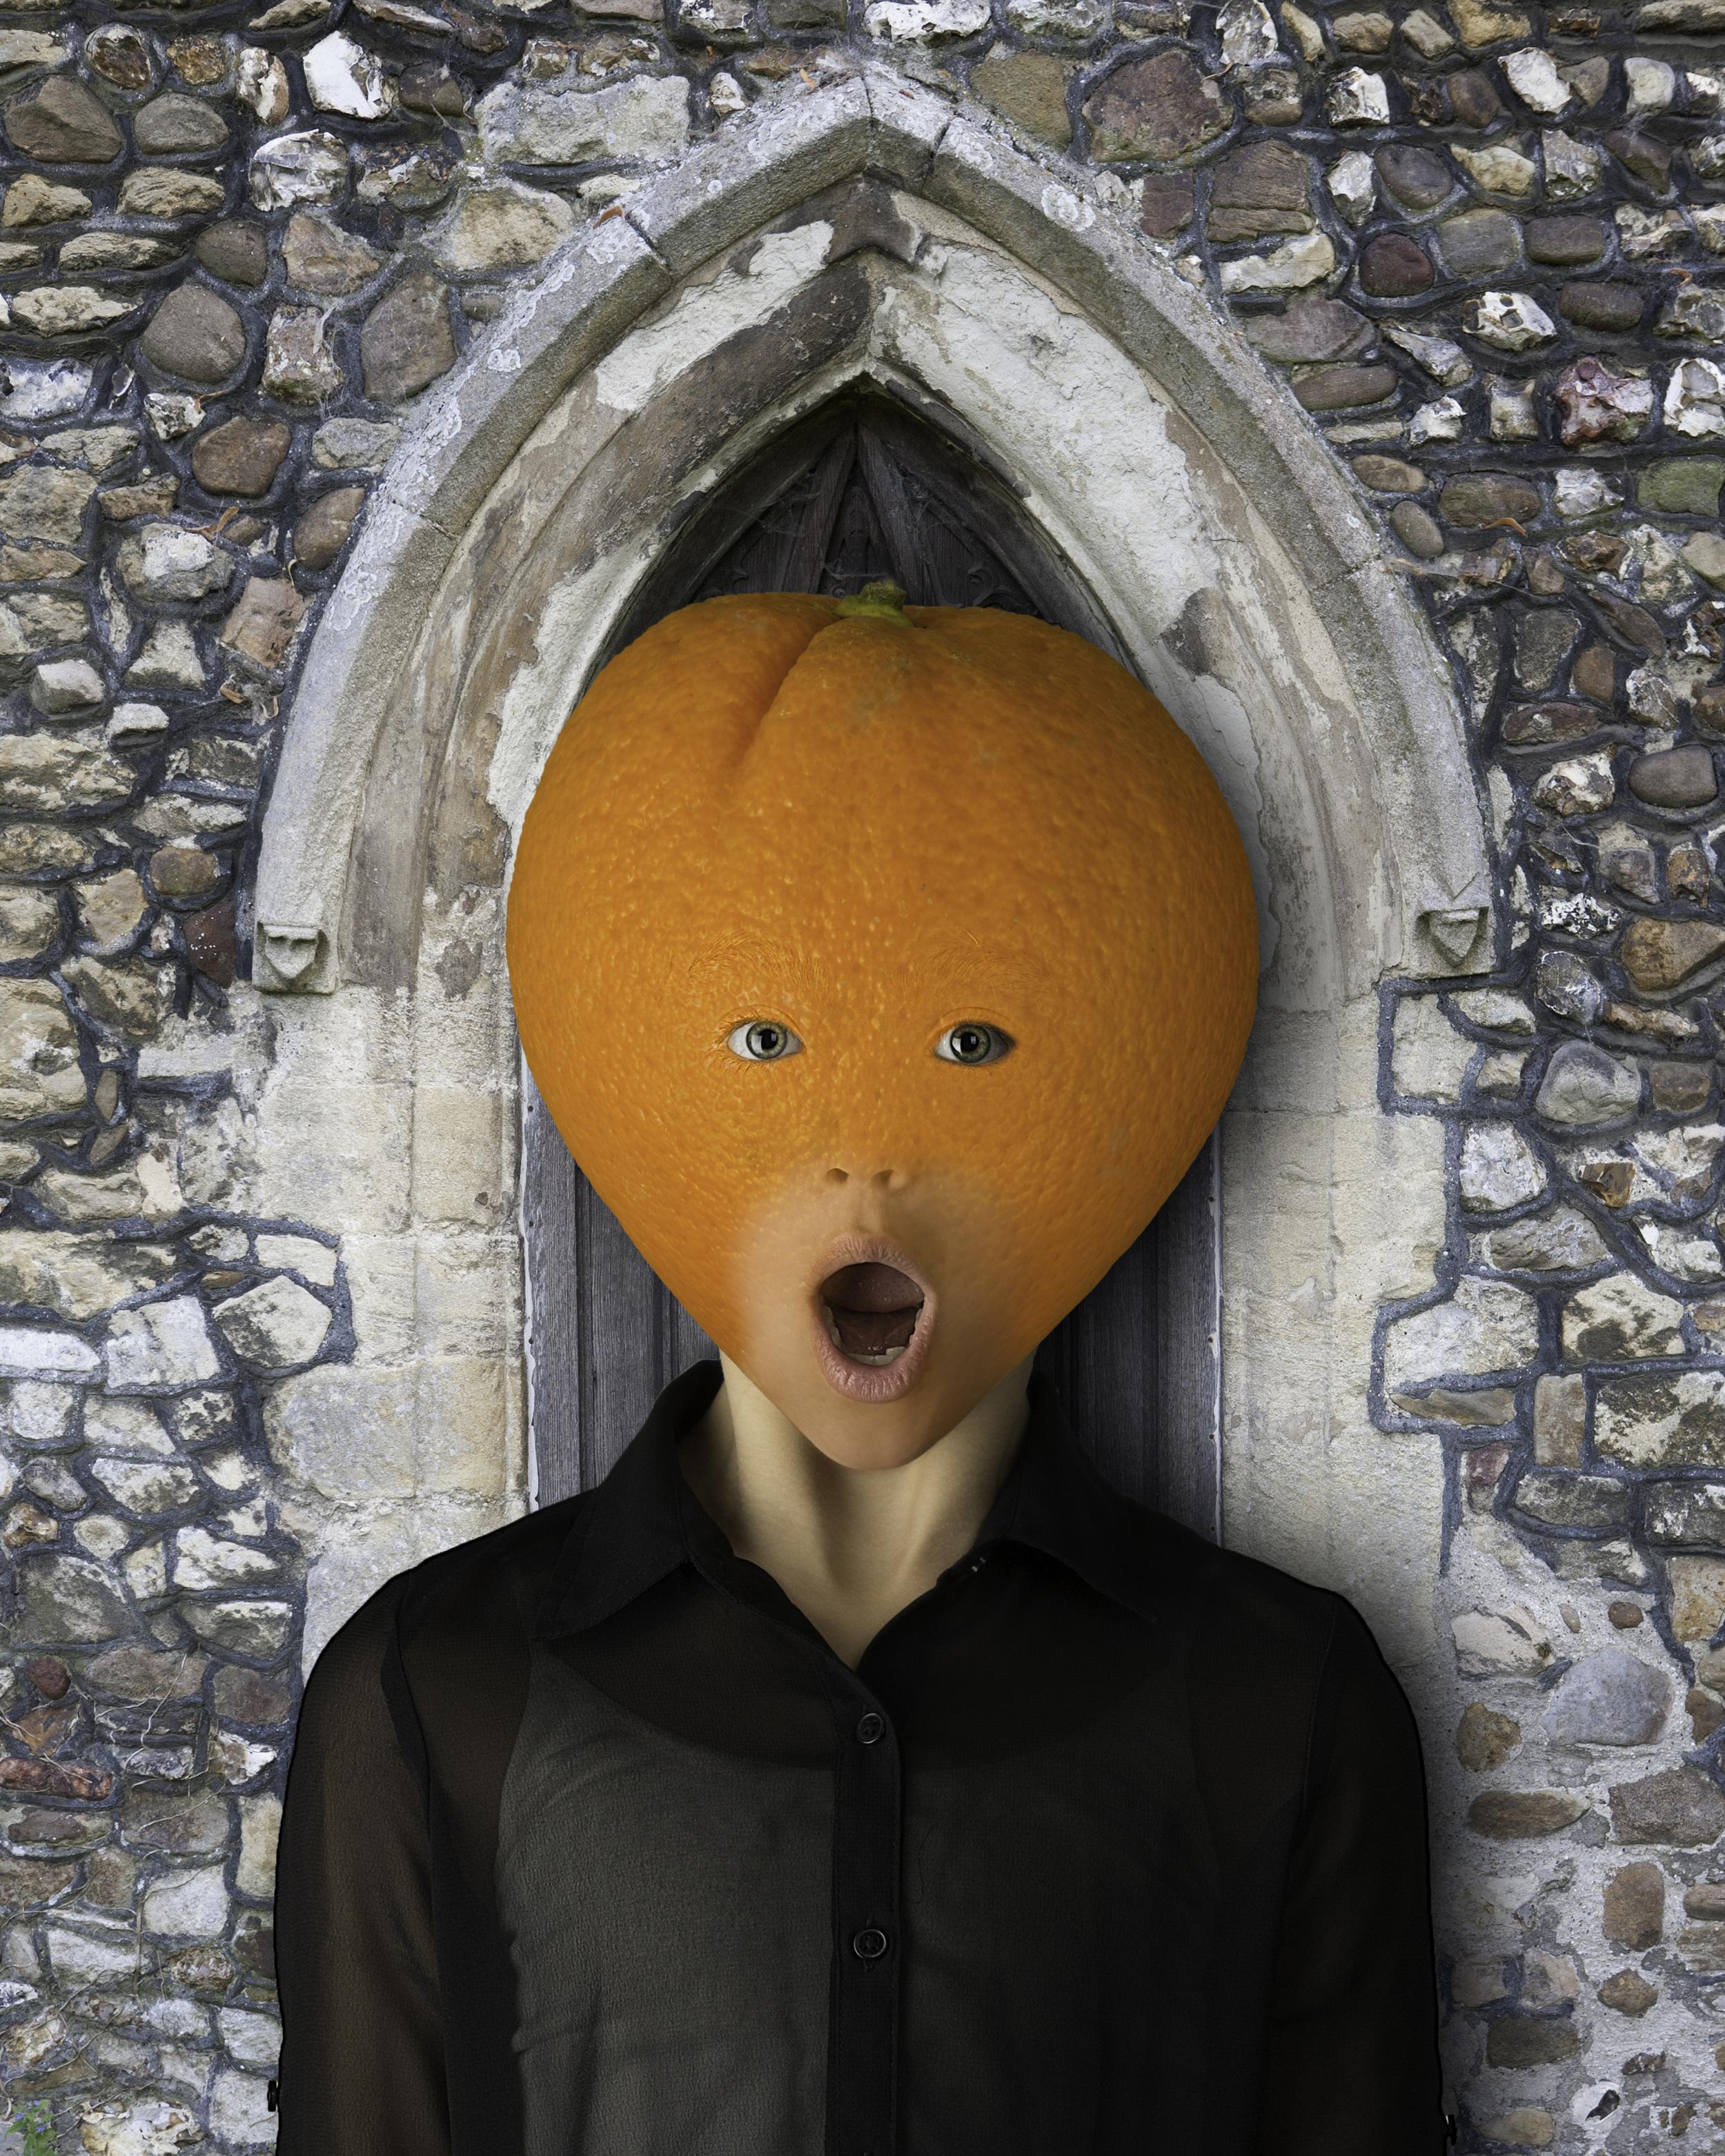 orang_head.jpg